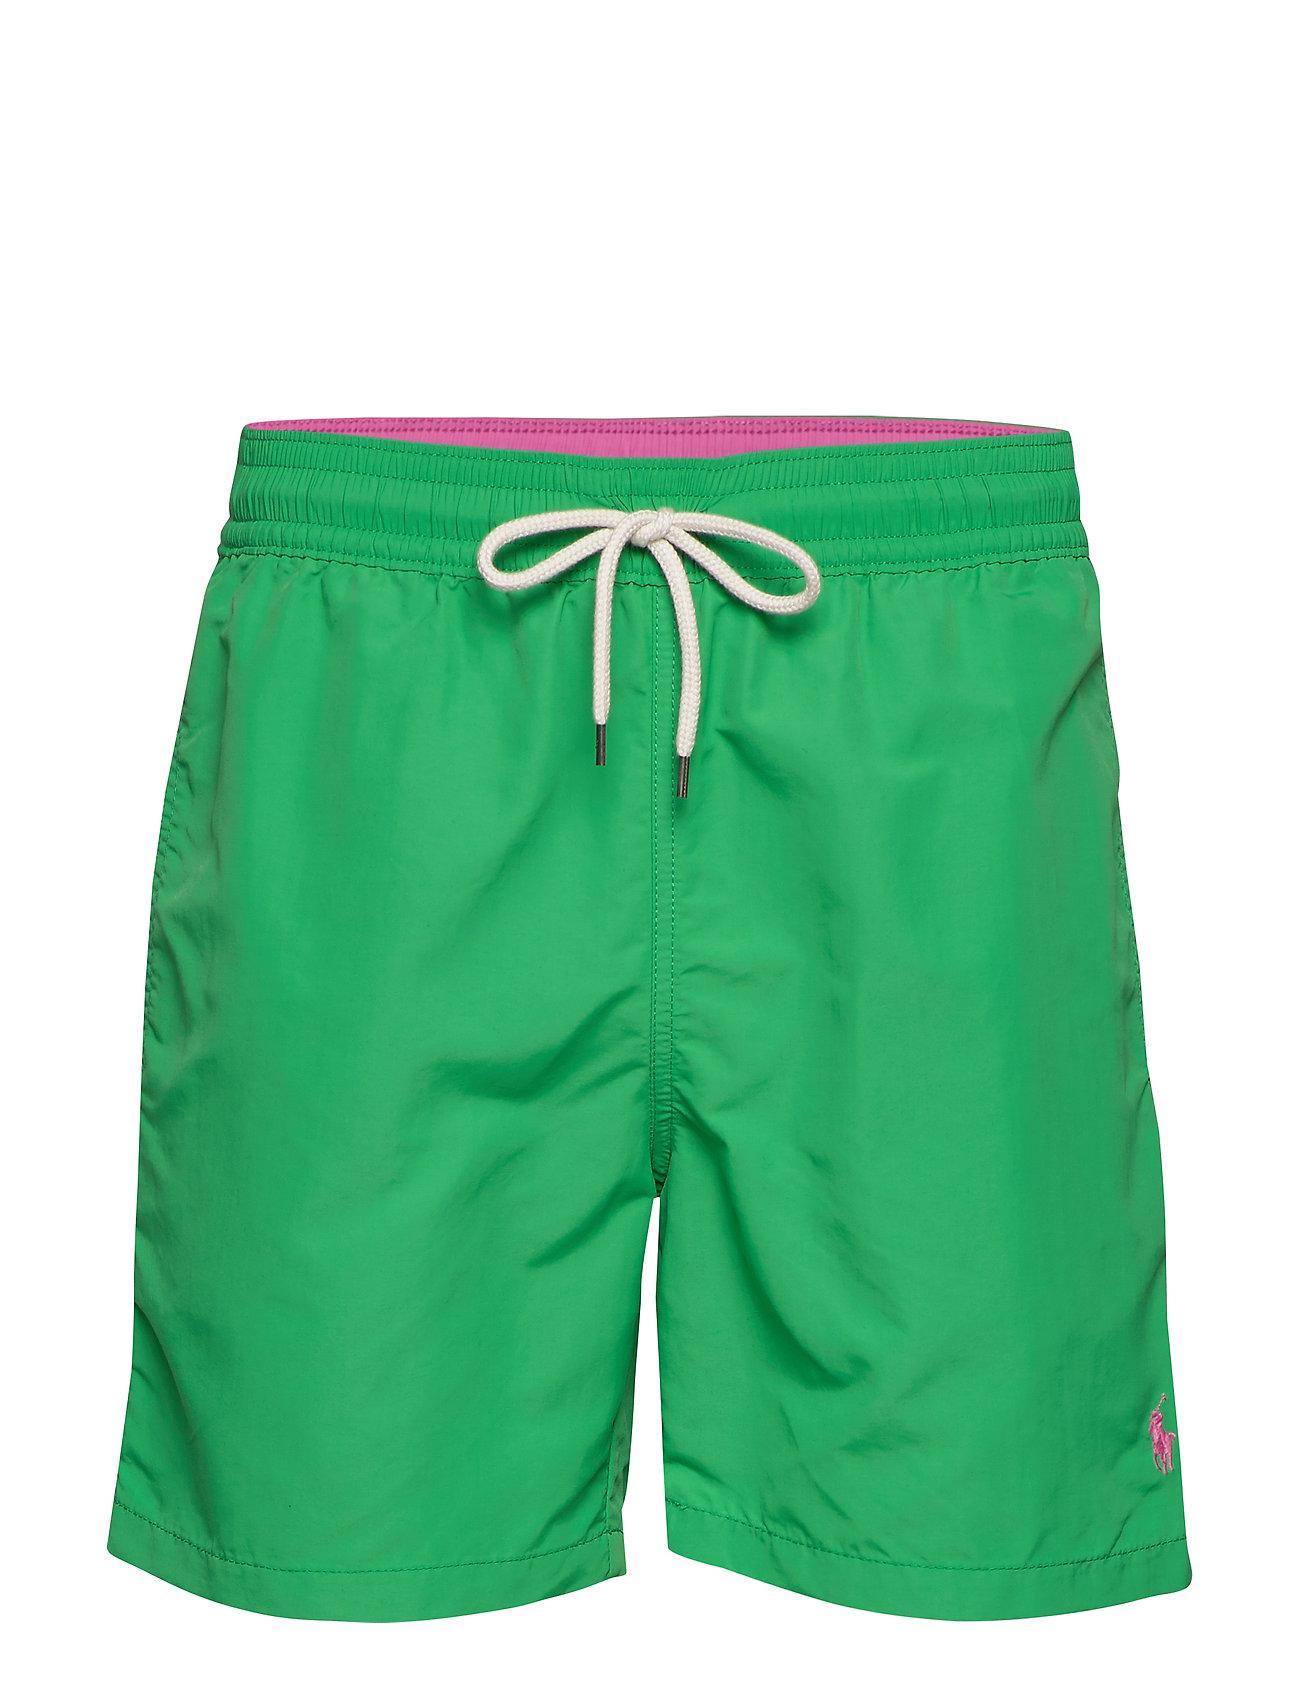 Polo Ralph Lauren 5½-Inch Traveler Swim Trunk - GOLF GREEN